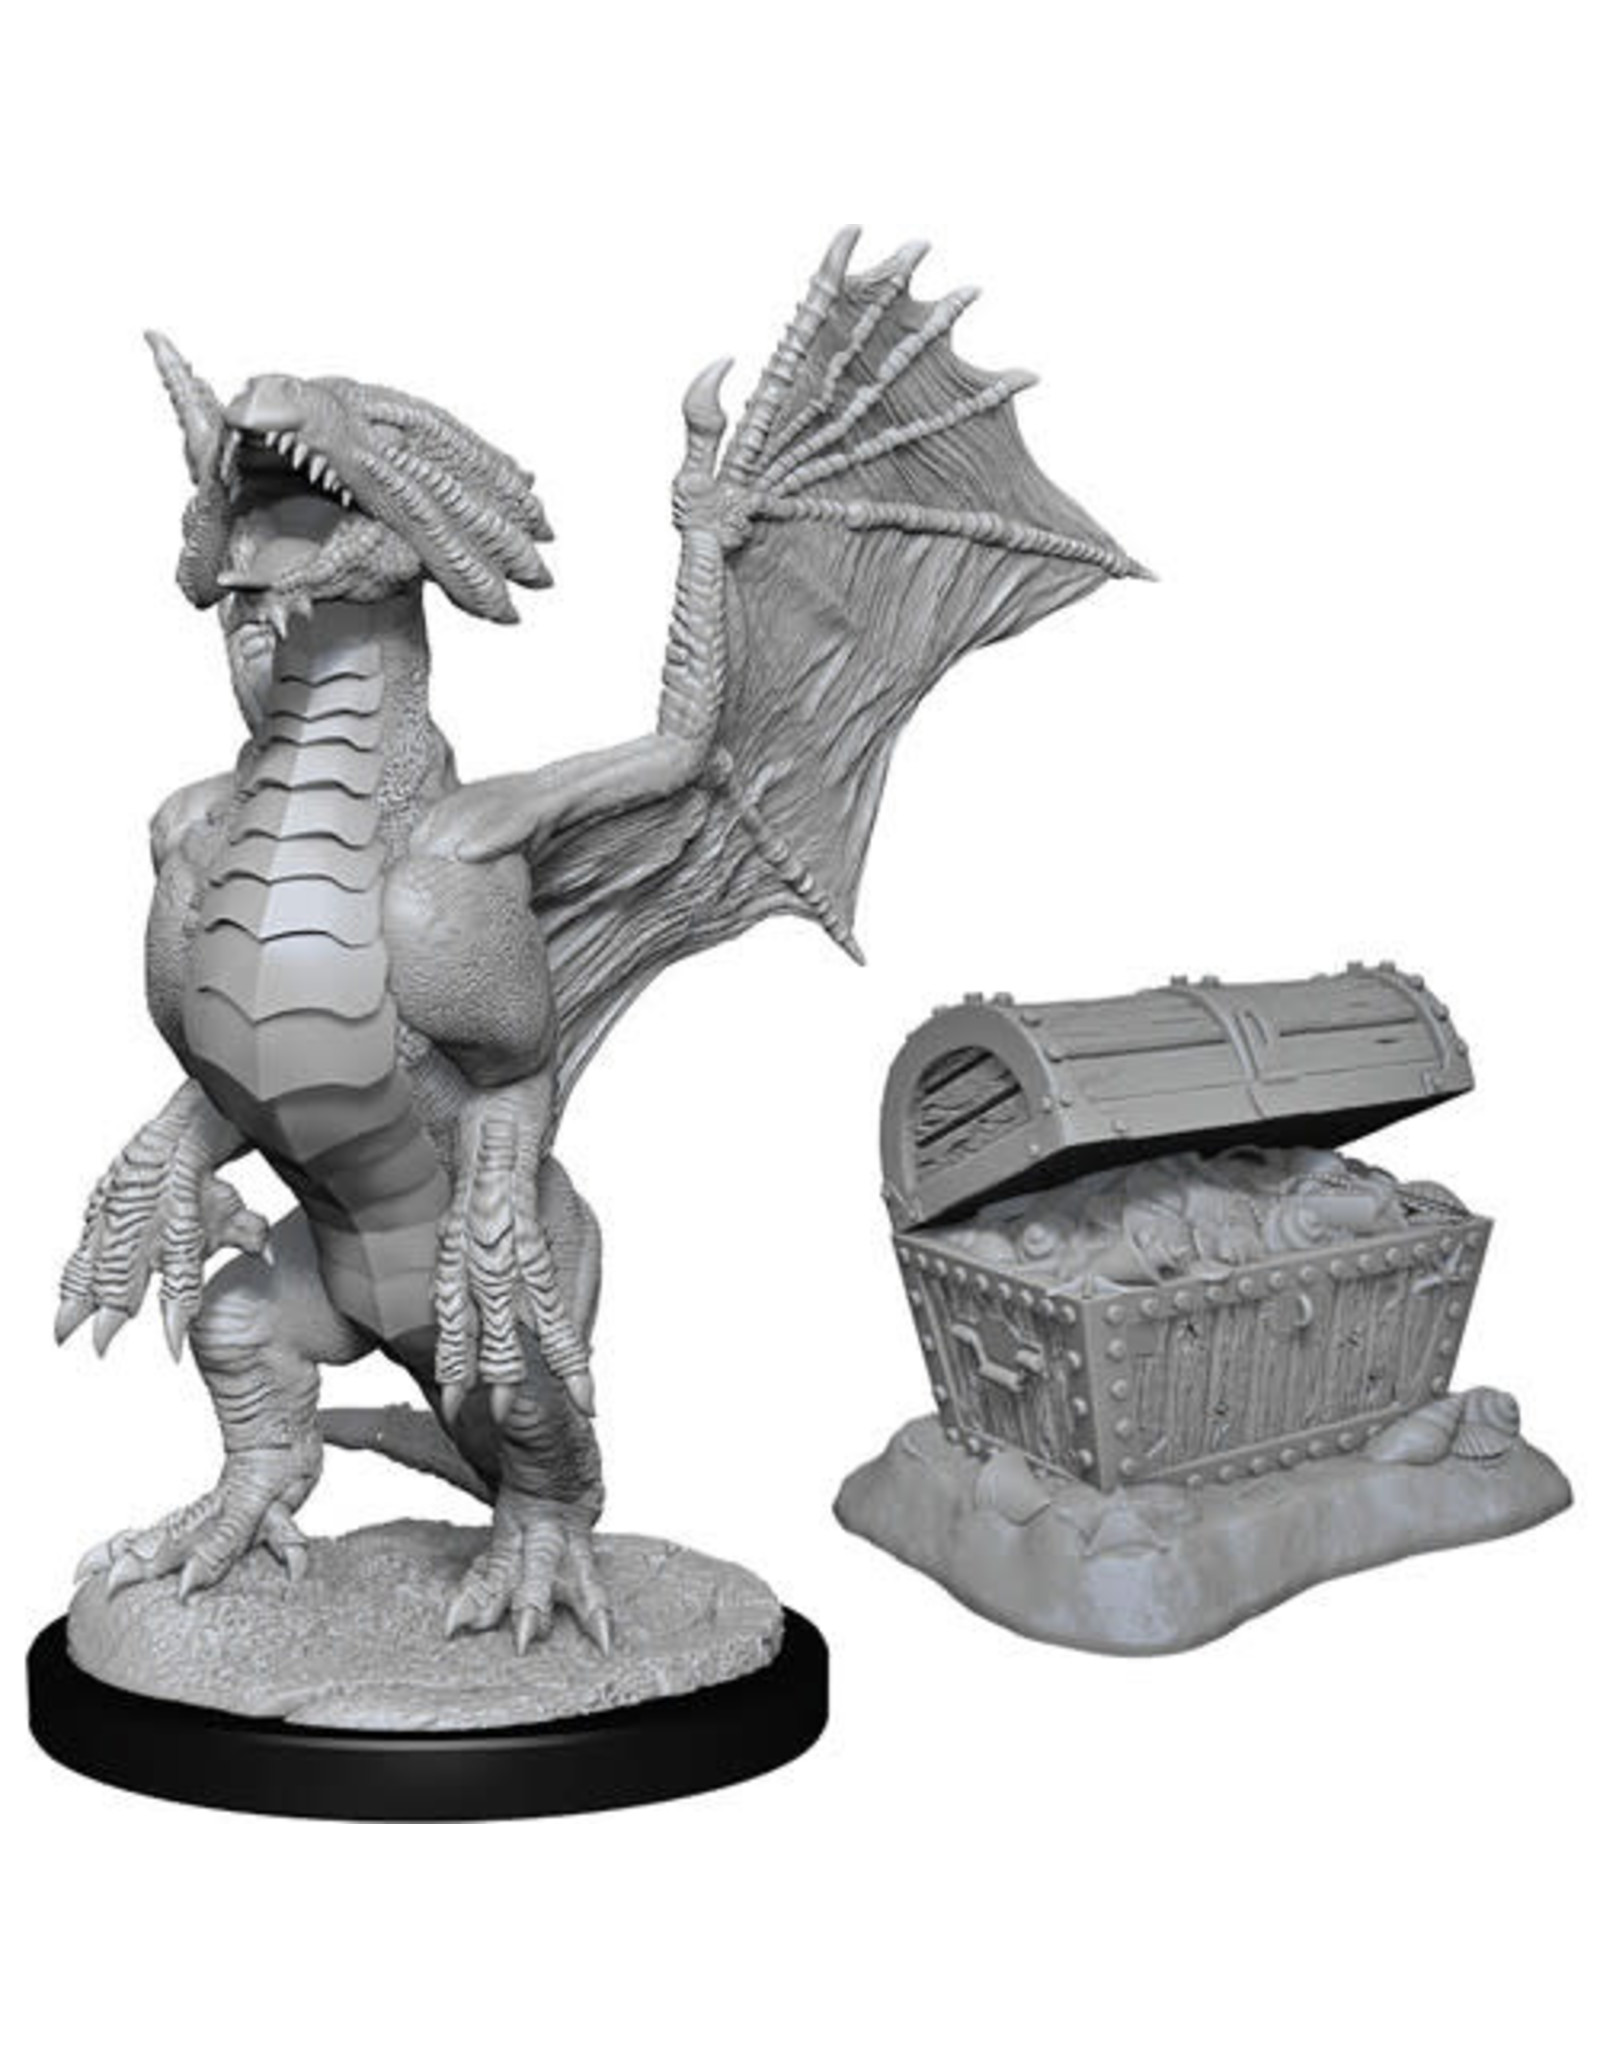 D&D Unpainted Minis: Bronze Dragon Wyrmling & Pile of Sea Found Treasure (Wave 13)